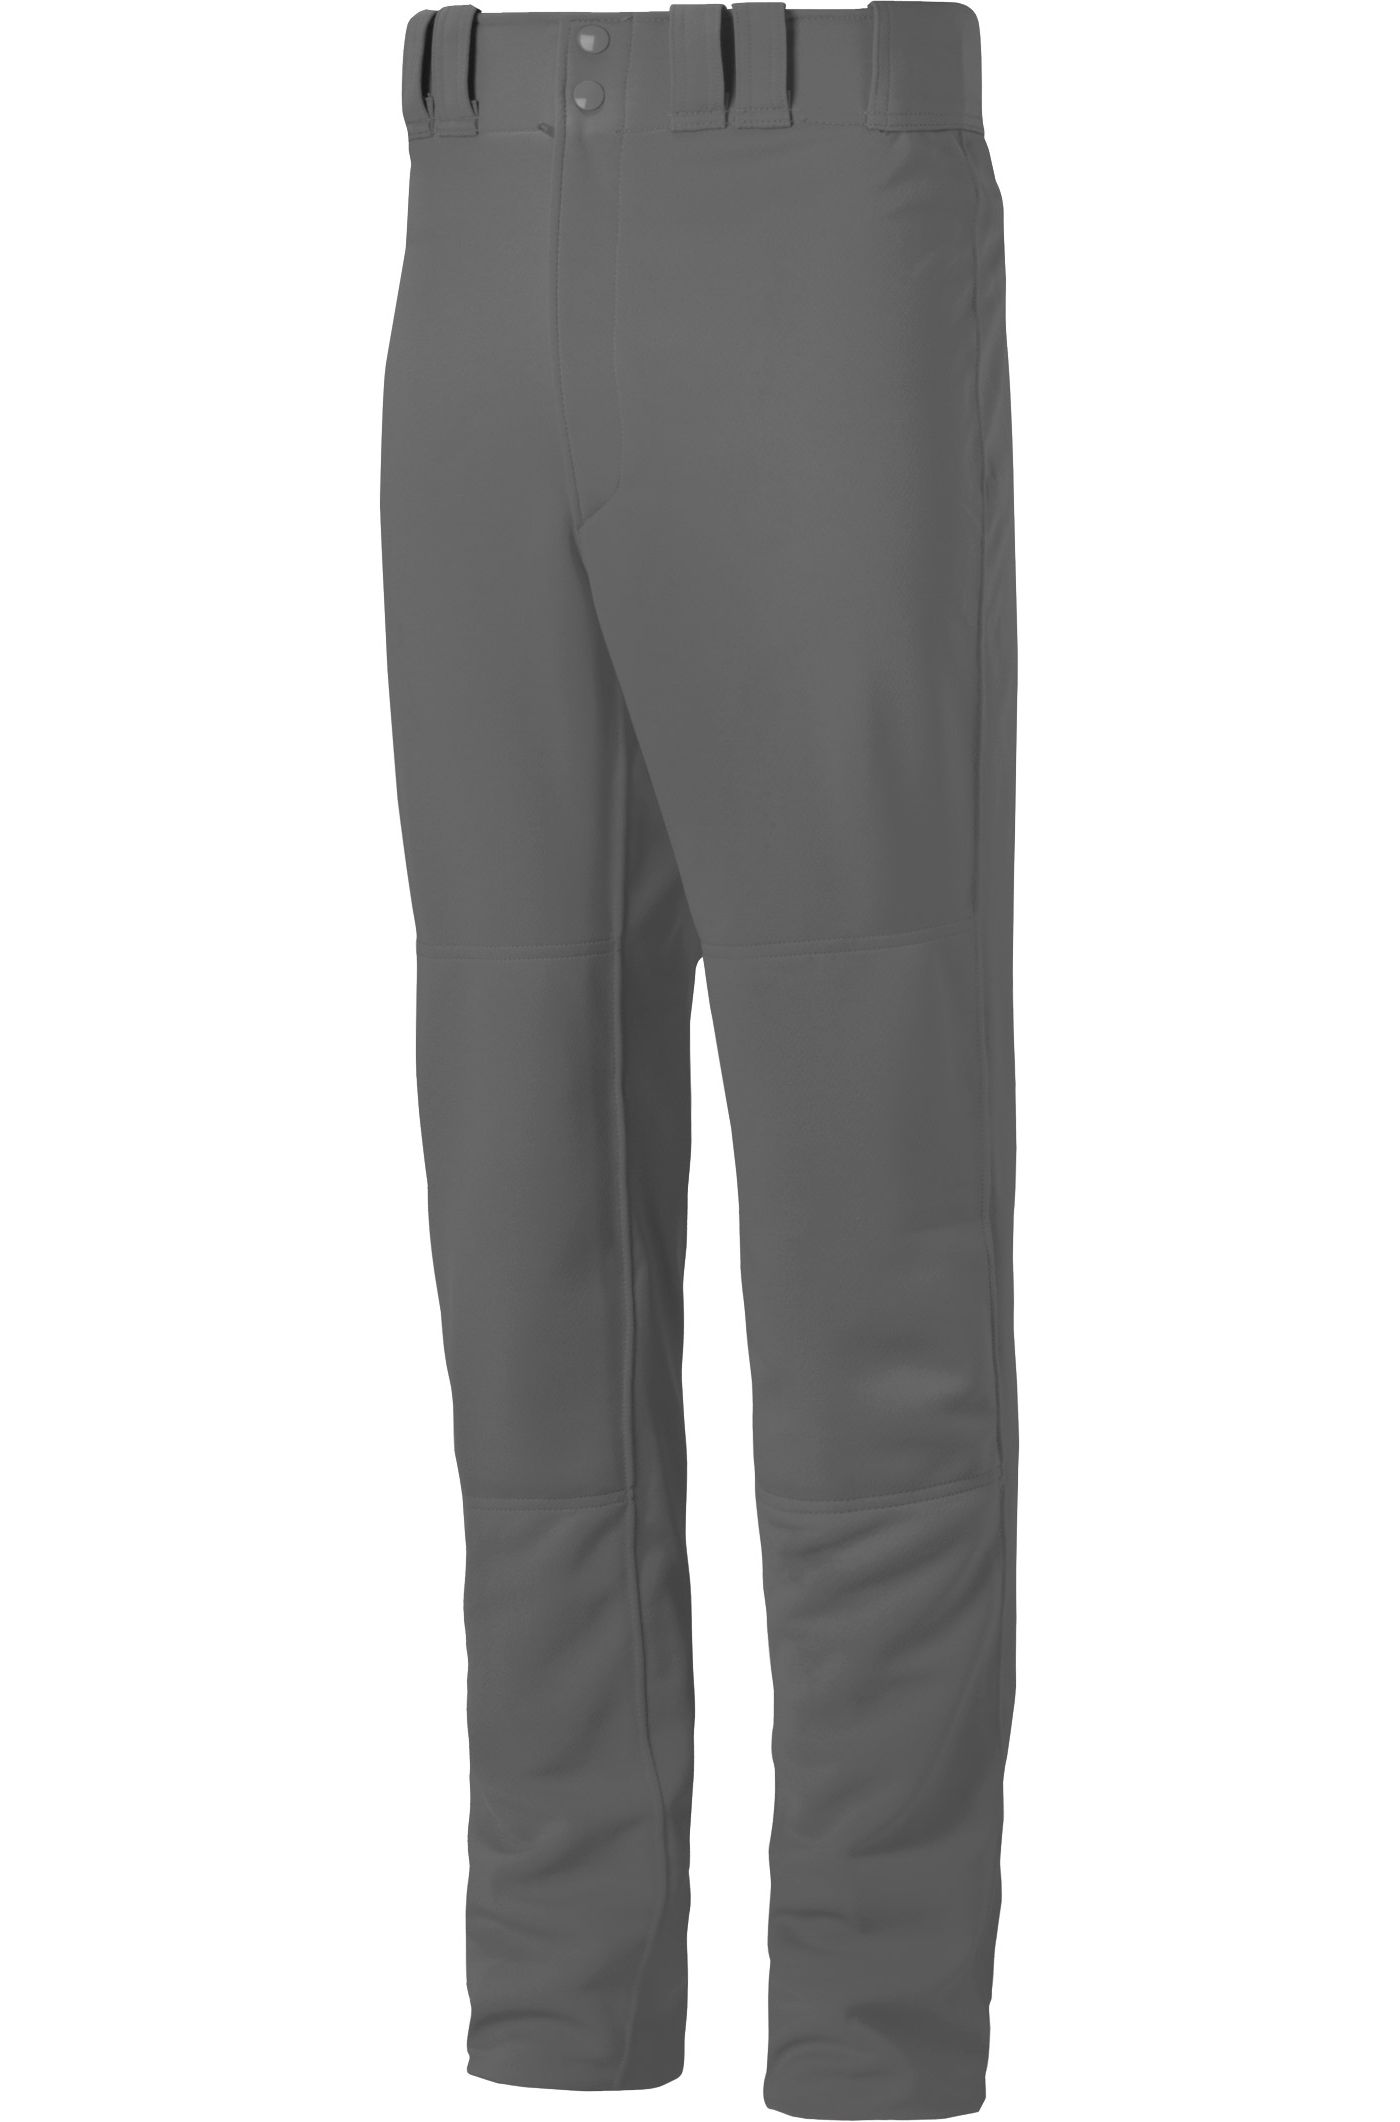 Mizuno Boys' Select Pro G2 Baseball Pants